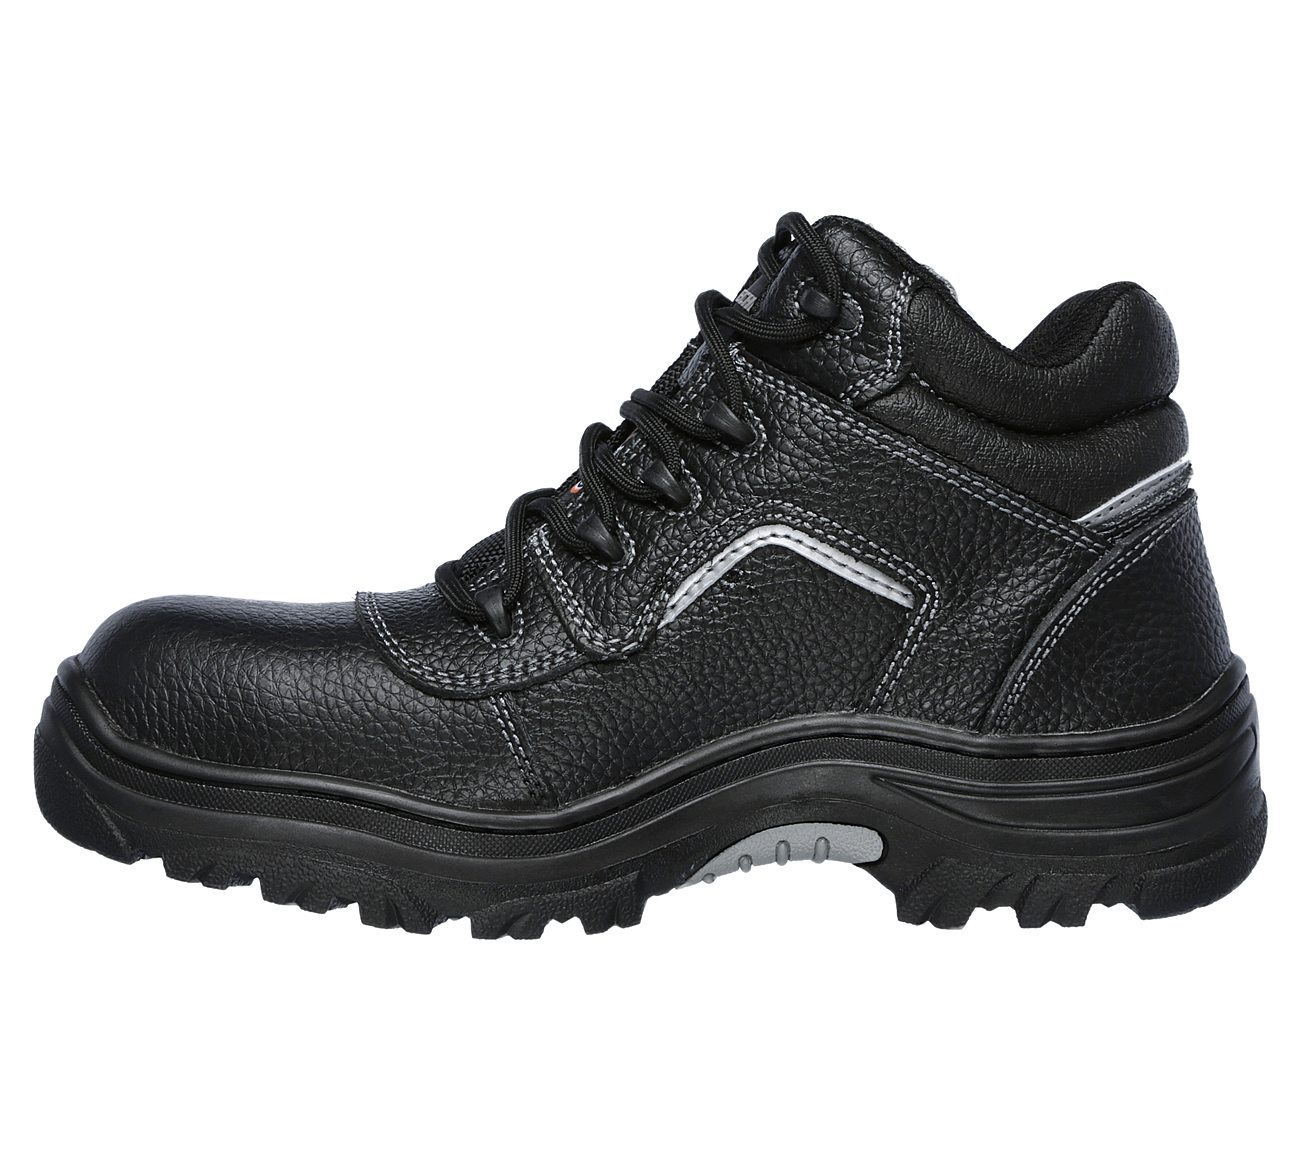 Skechers for Work Mens Burgin Comp Toe Work Boot 77067